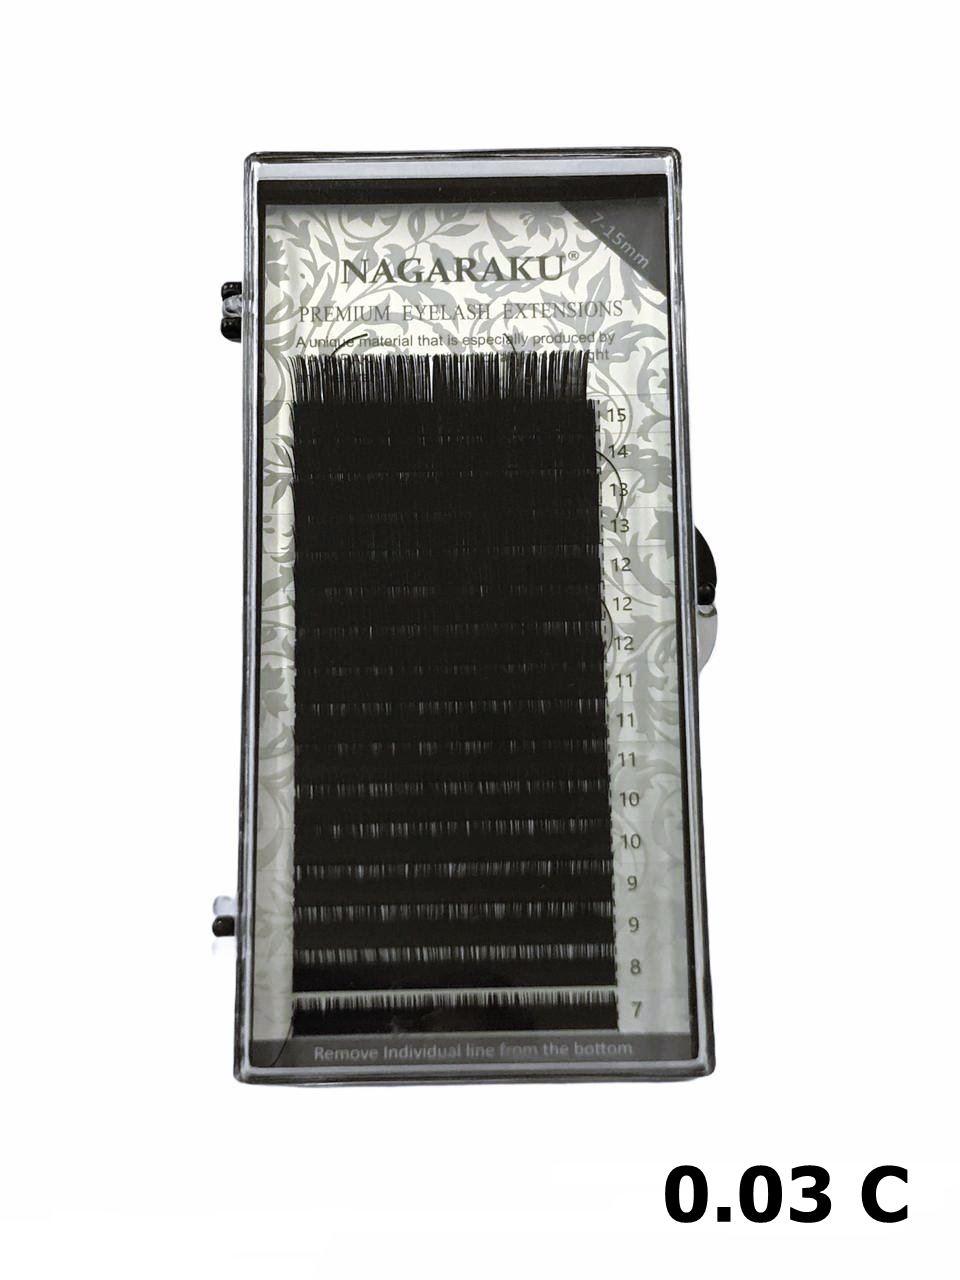 Cílios Nagaraku Premium Mink Mix 7-15mm Fio A Fio 0.03 C